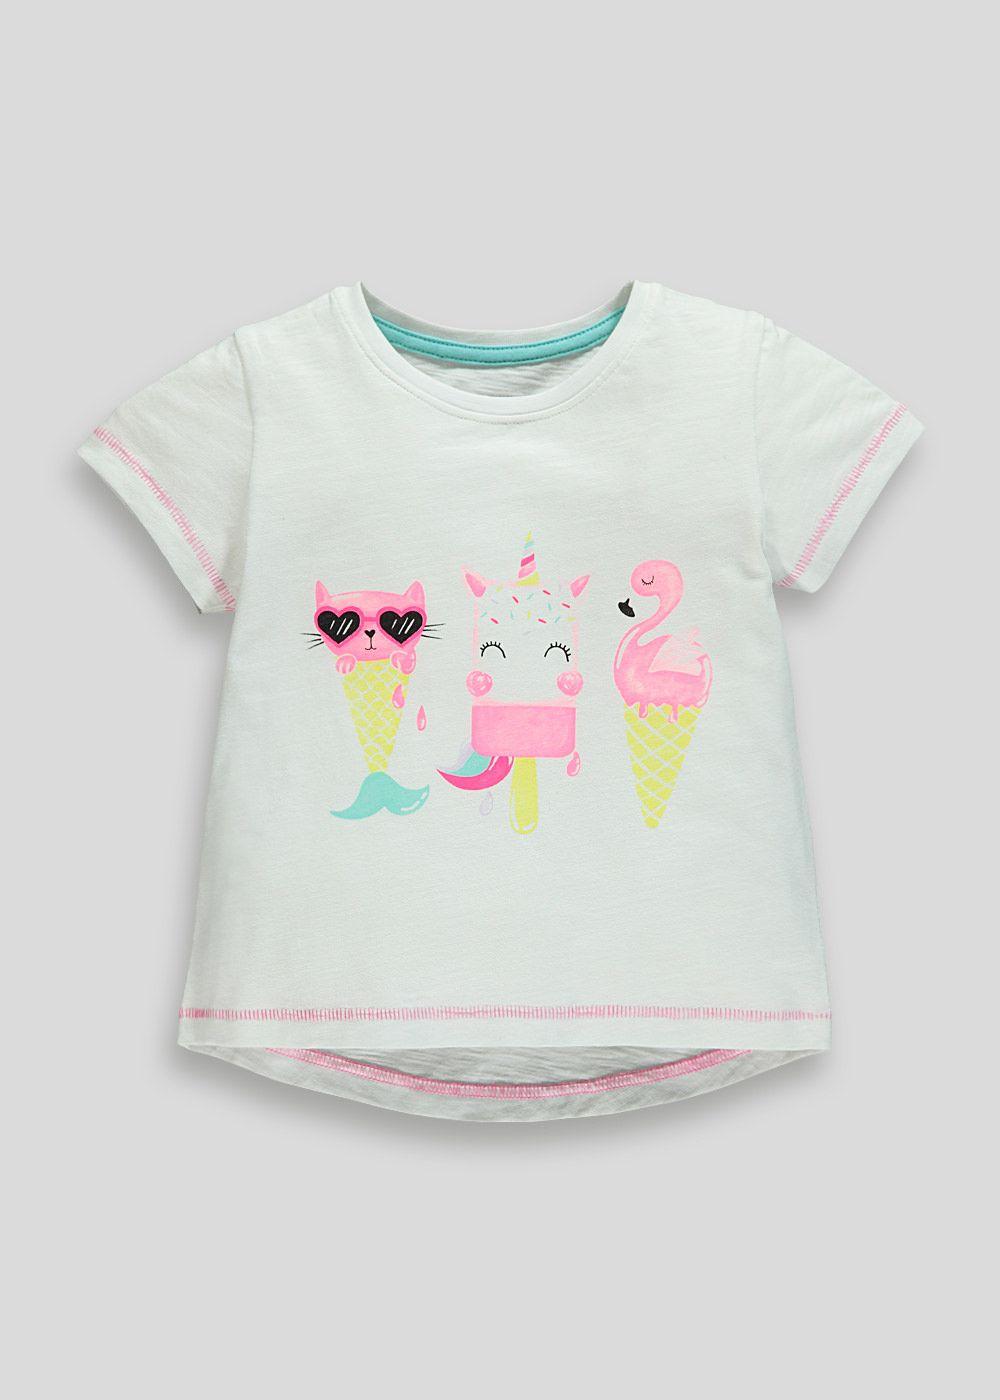 Kids ice cream tshirt 9mths6yrs white